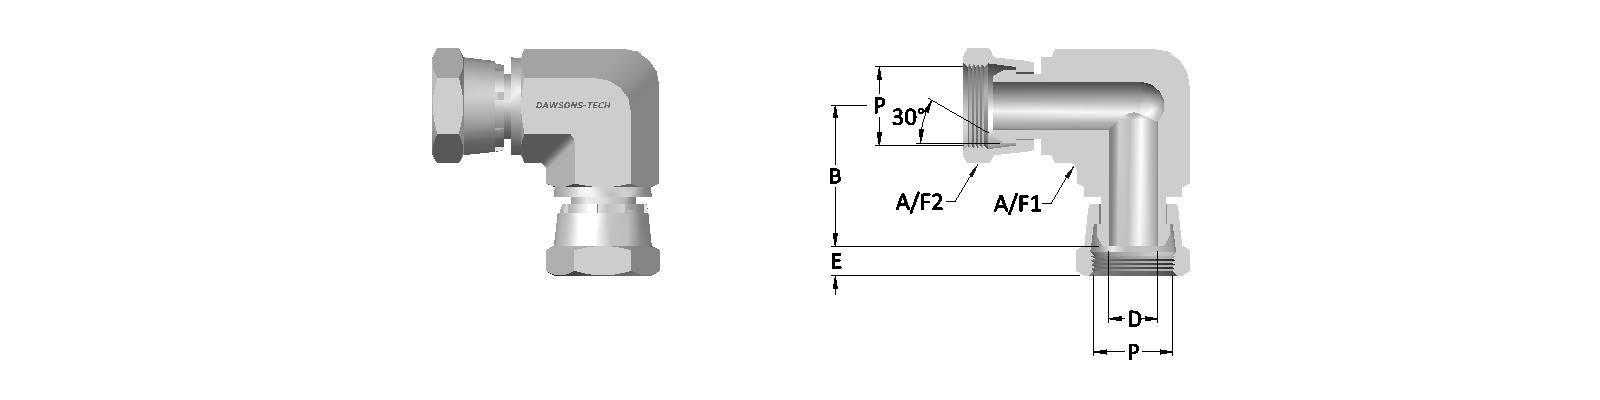 06 Female Swivel Union Elbow BSP (Parallel) Thread-Model